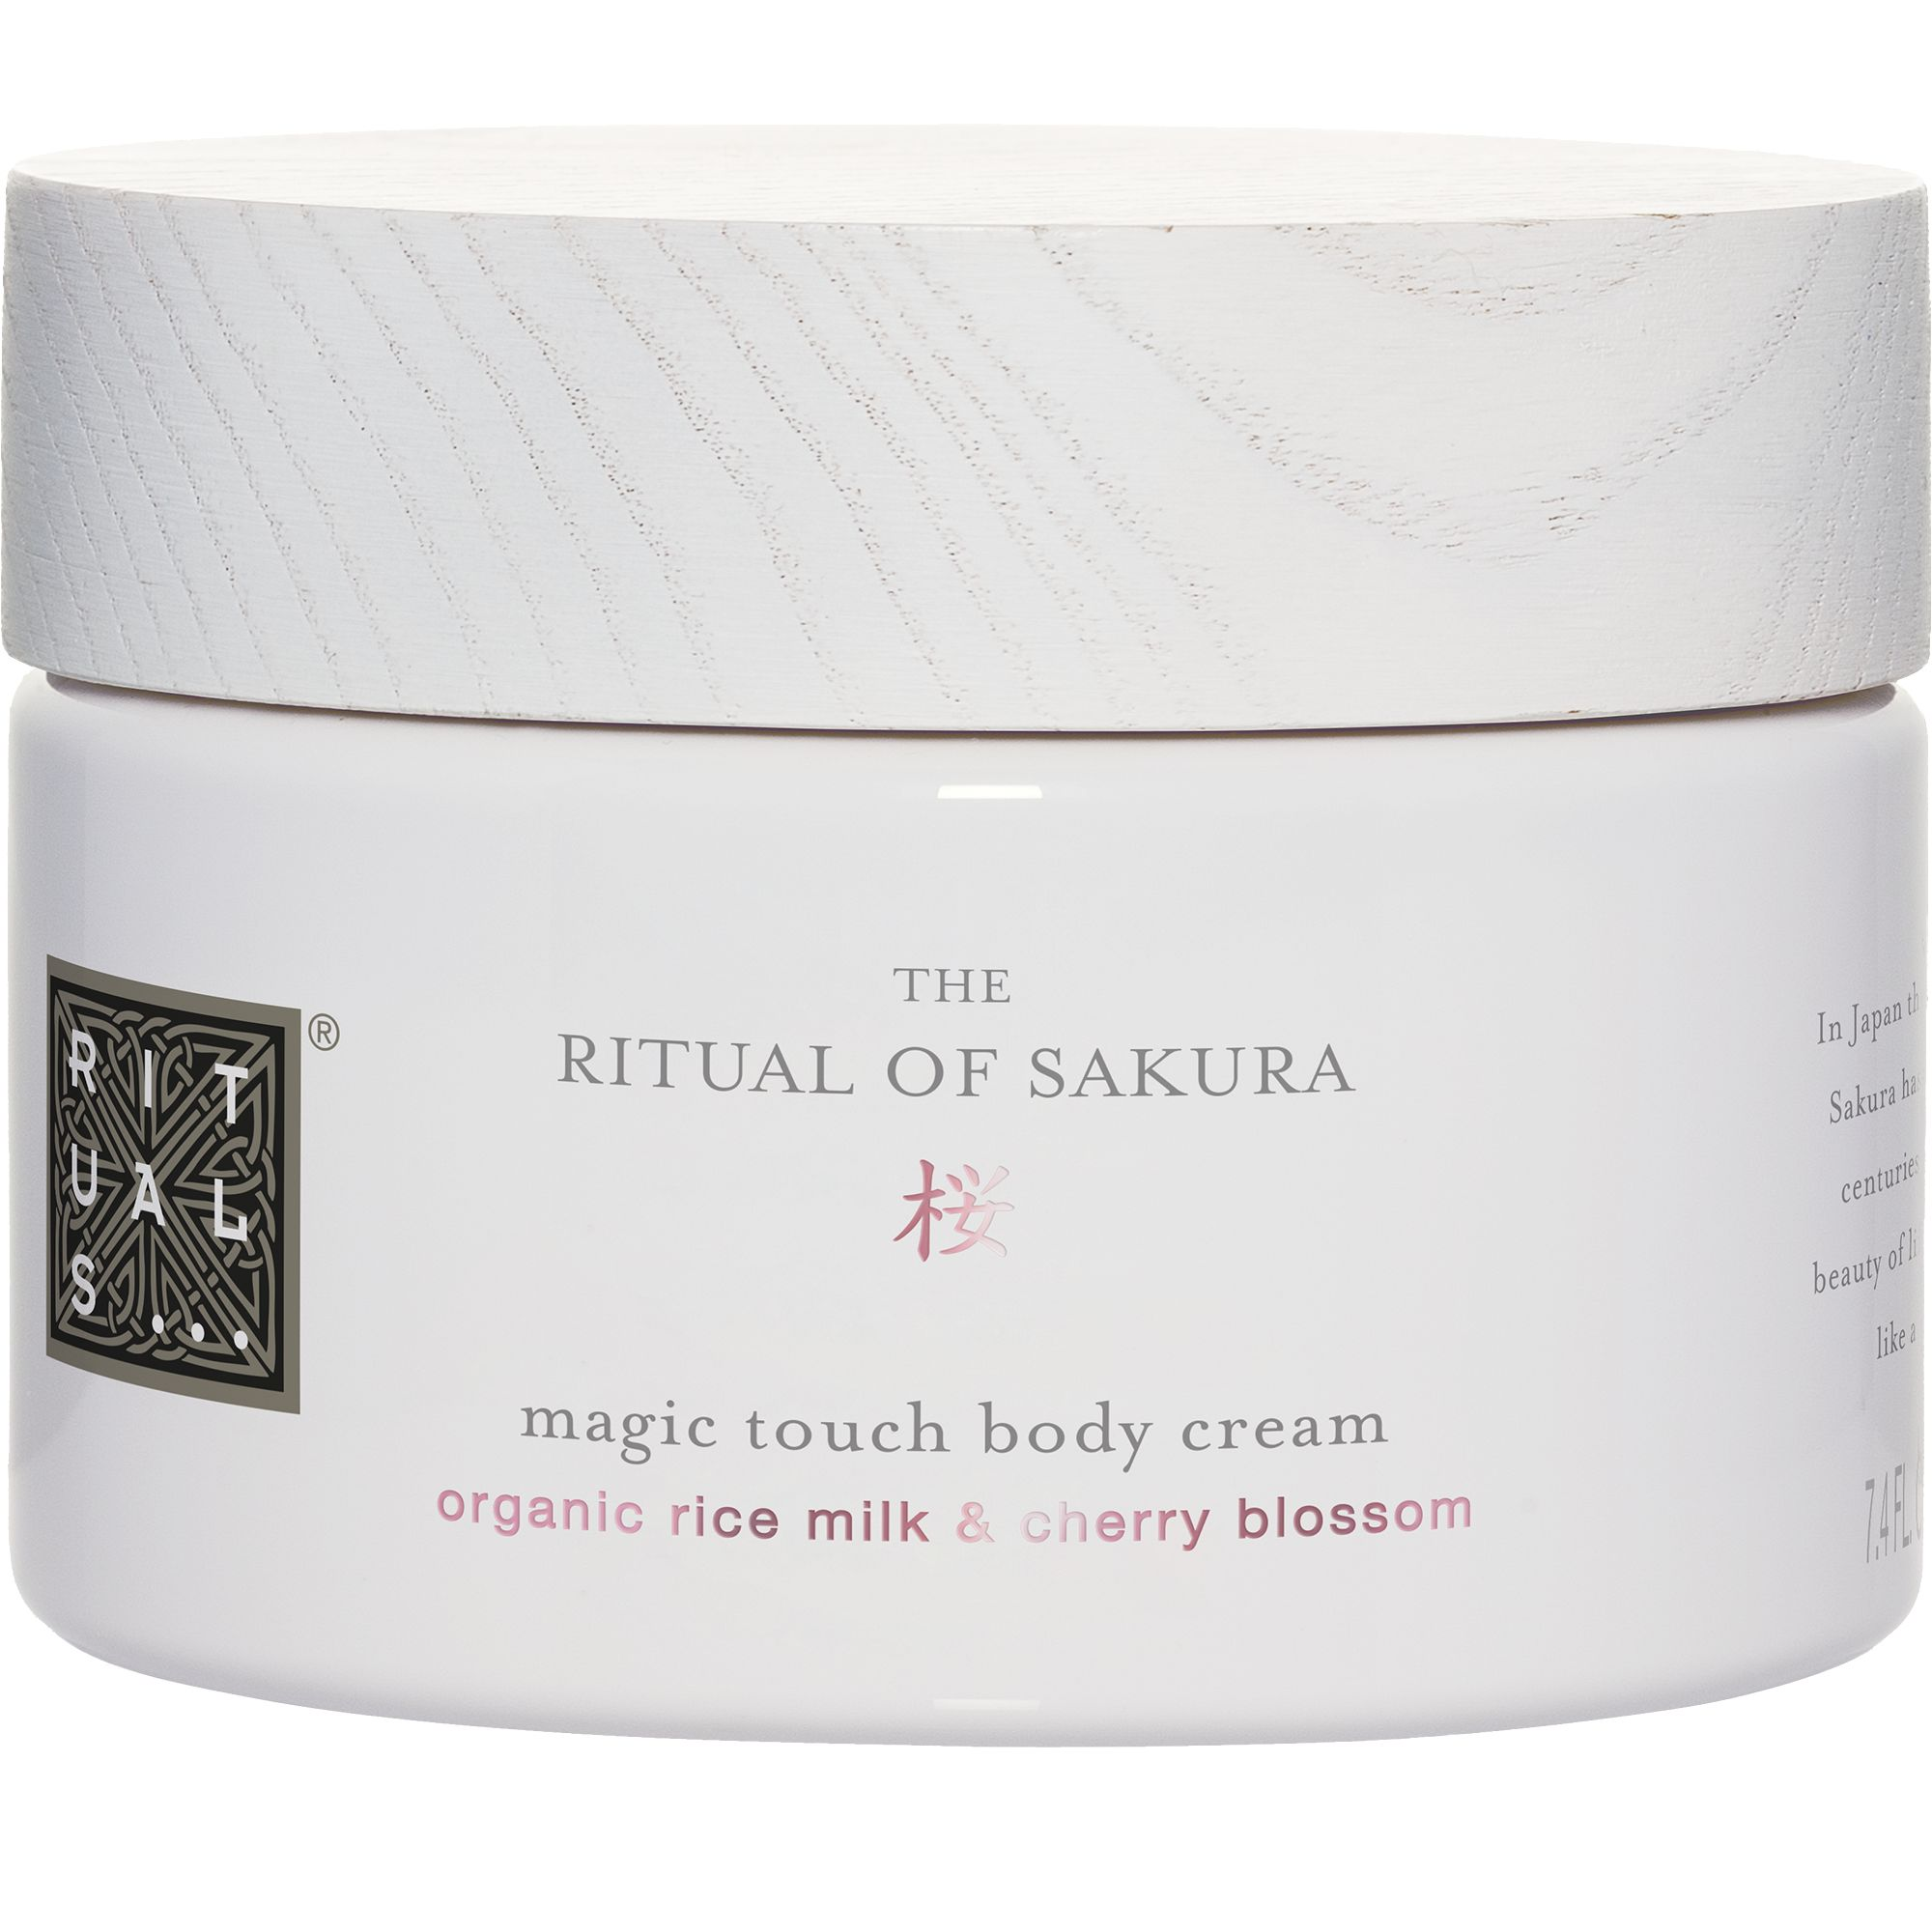 Rituals The Ritual of Sakura Body Cream, 220 ml